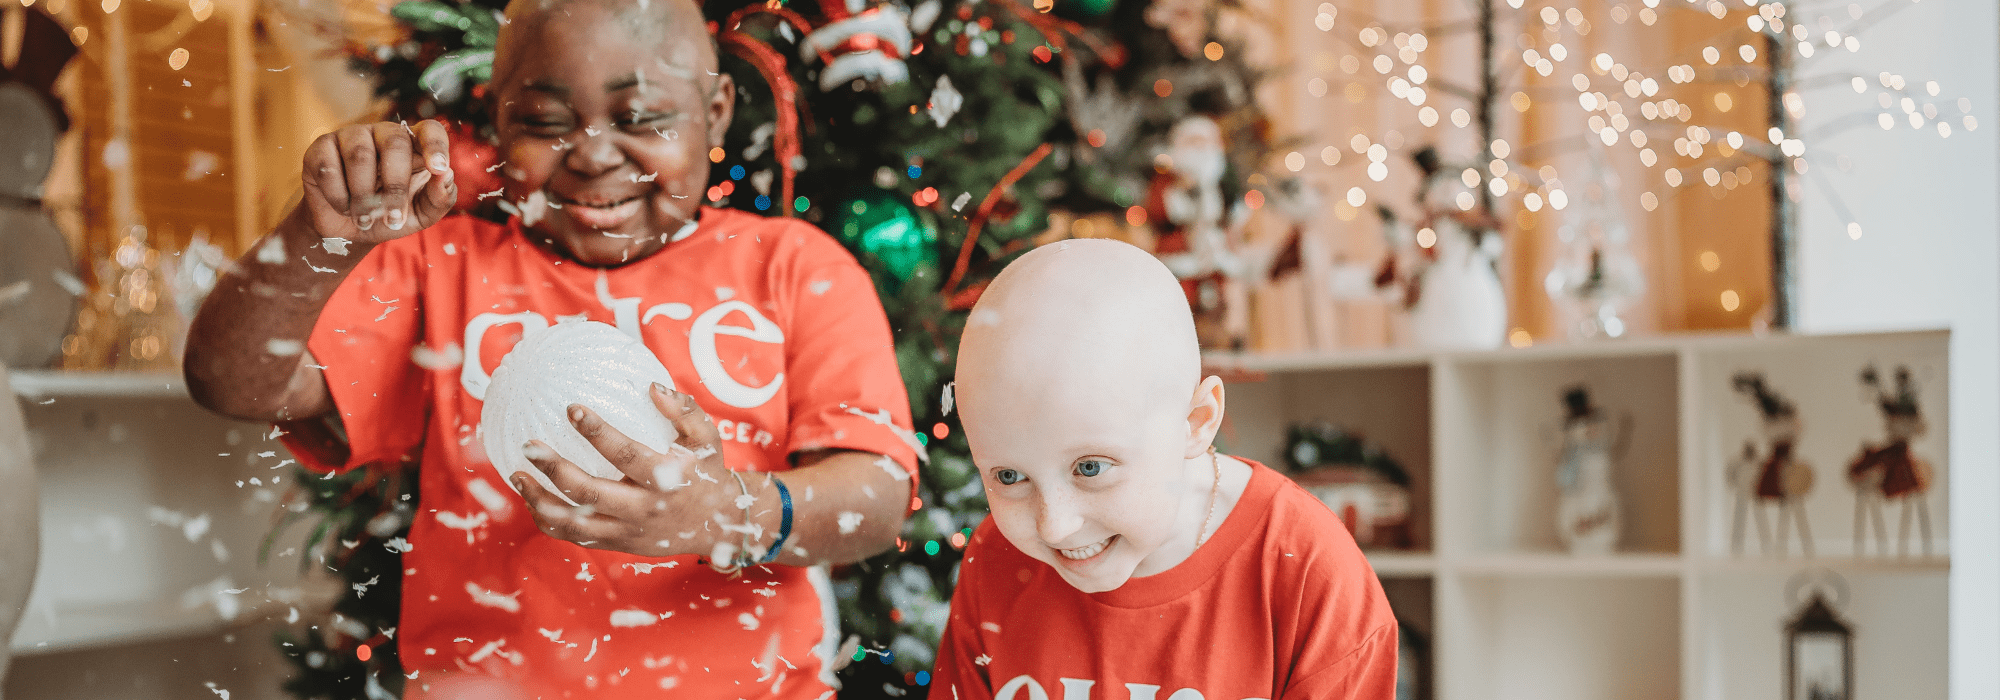 Cancer for Christmas